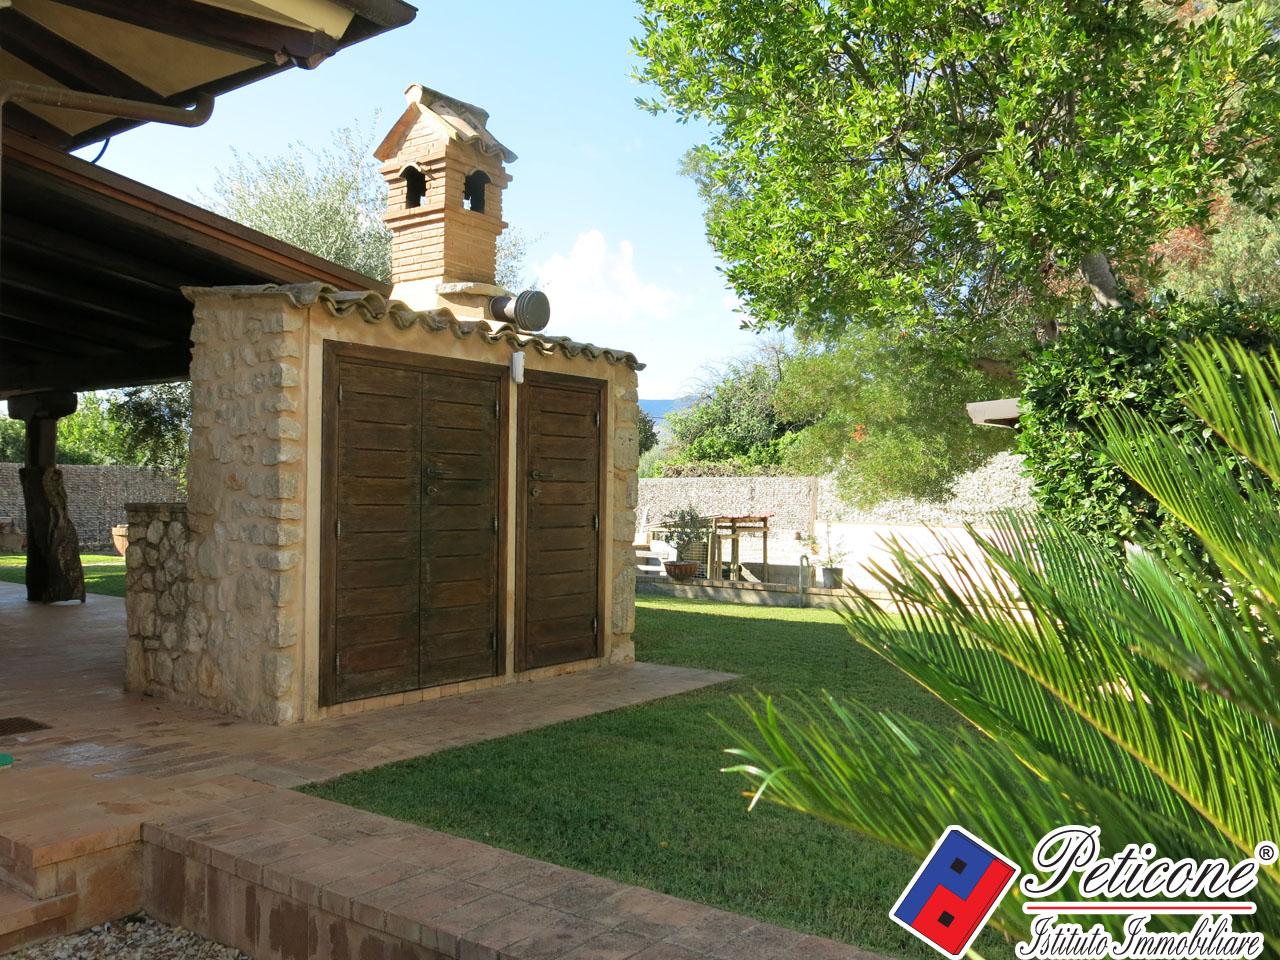 Villa in Vendita a Fondi: 3 locali, 107 mq - Foto 20